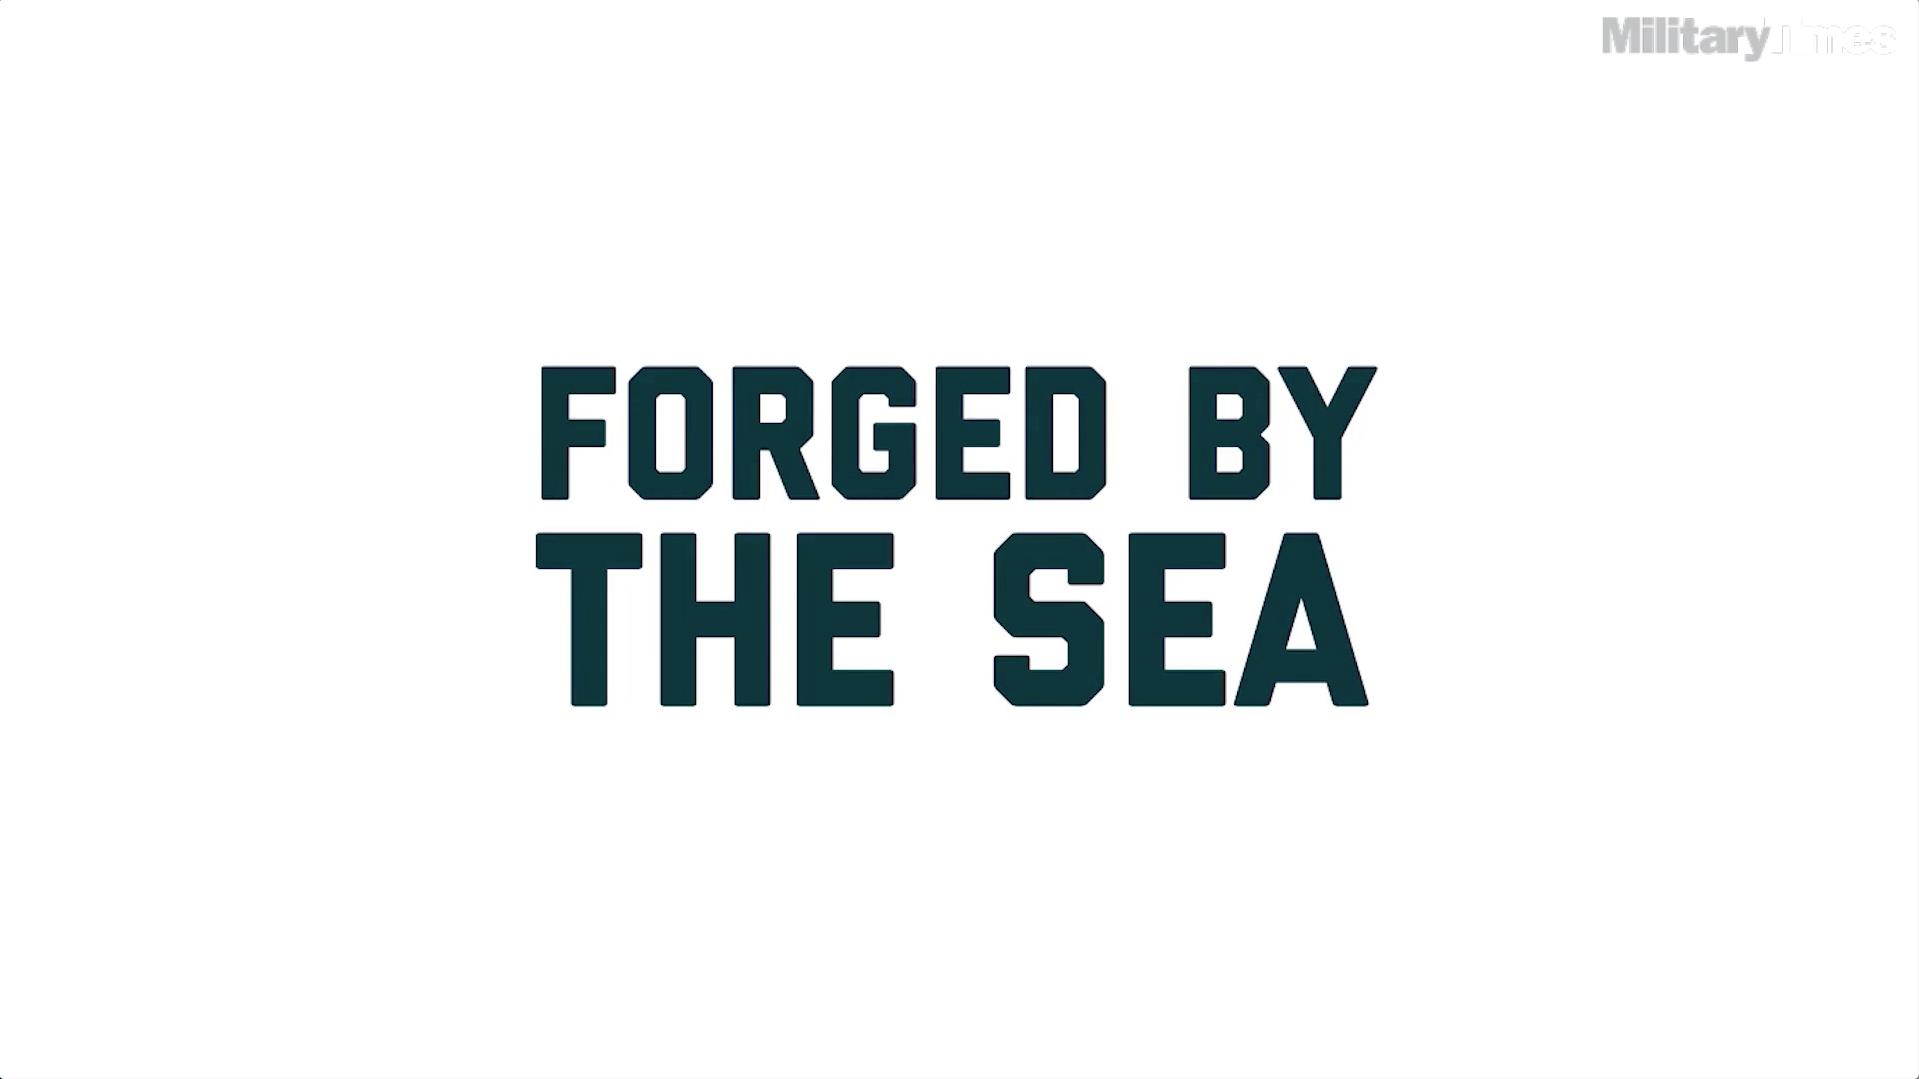 Navy unveils new slogan